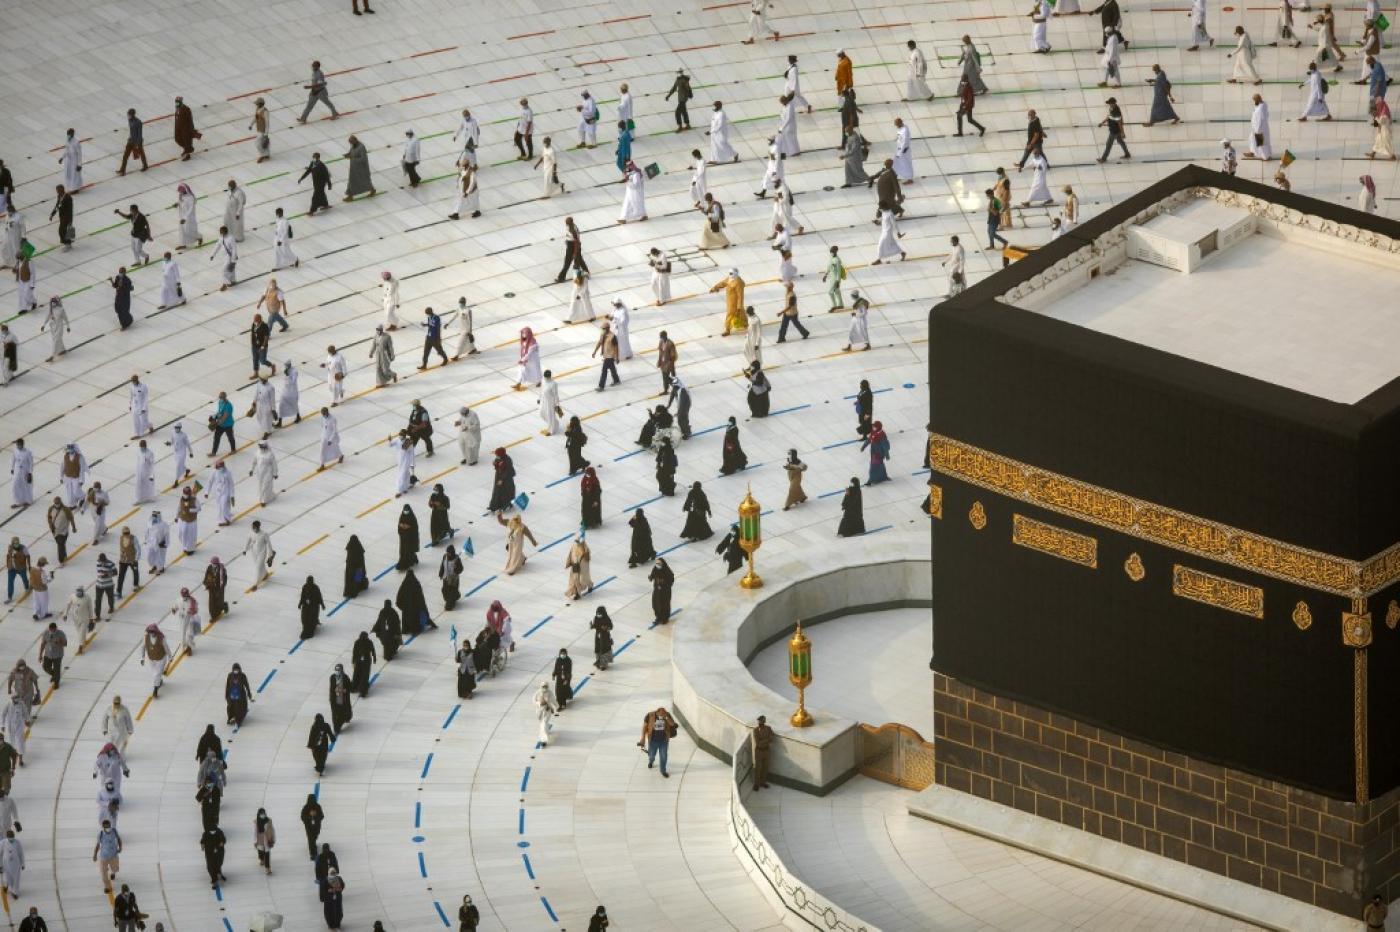 Covid-19: Saudi Arabia says vaccine is a must for Hajj